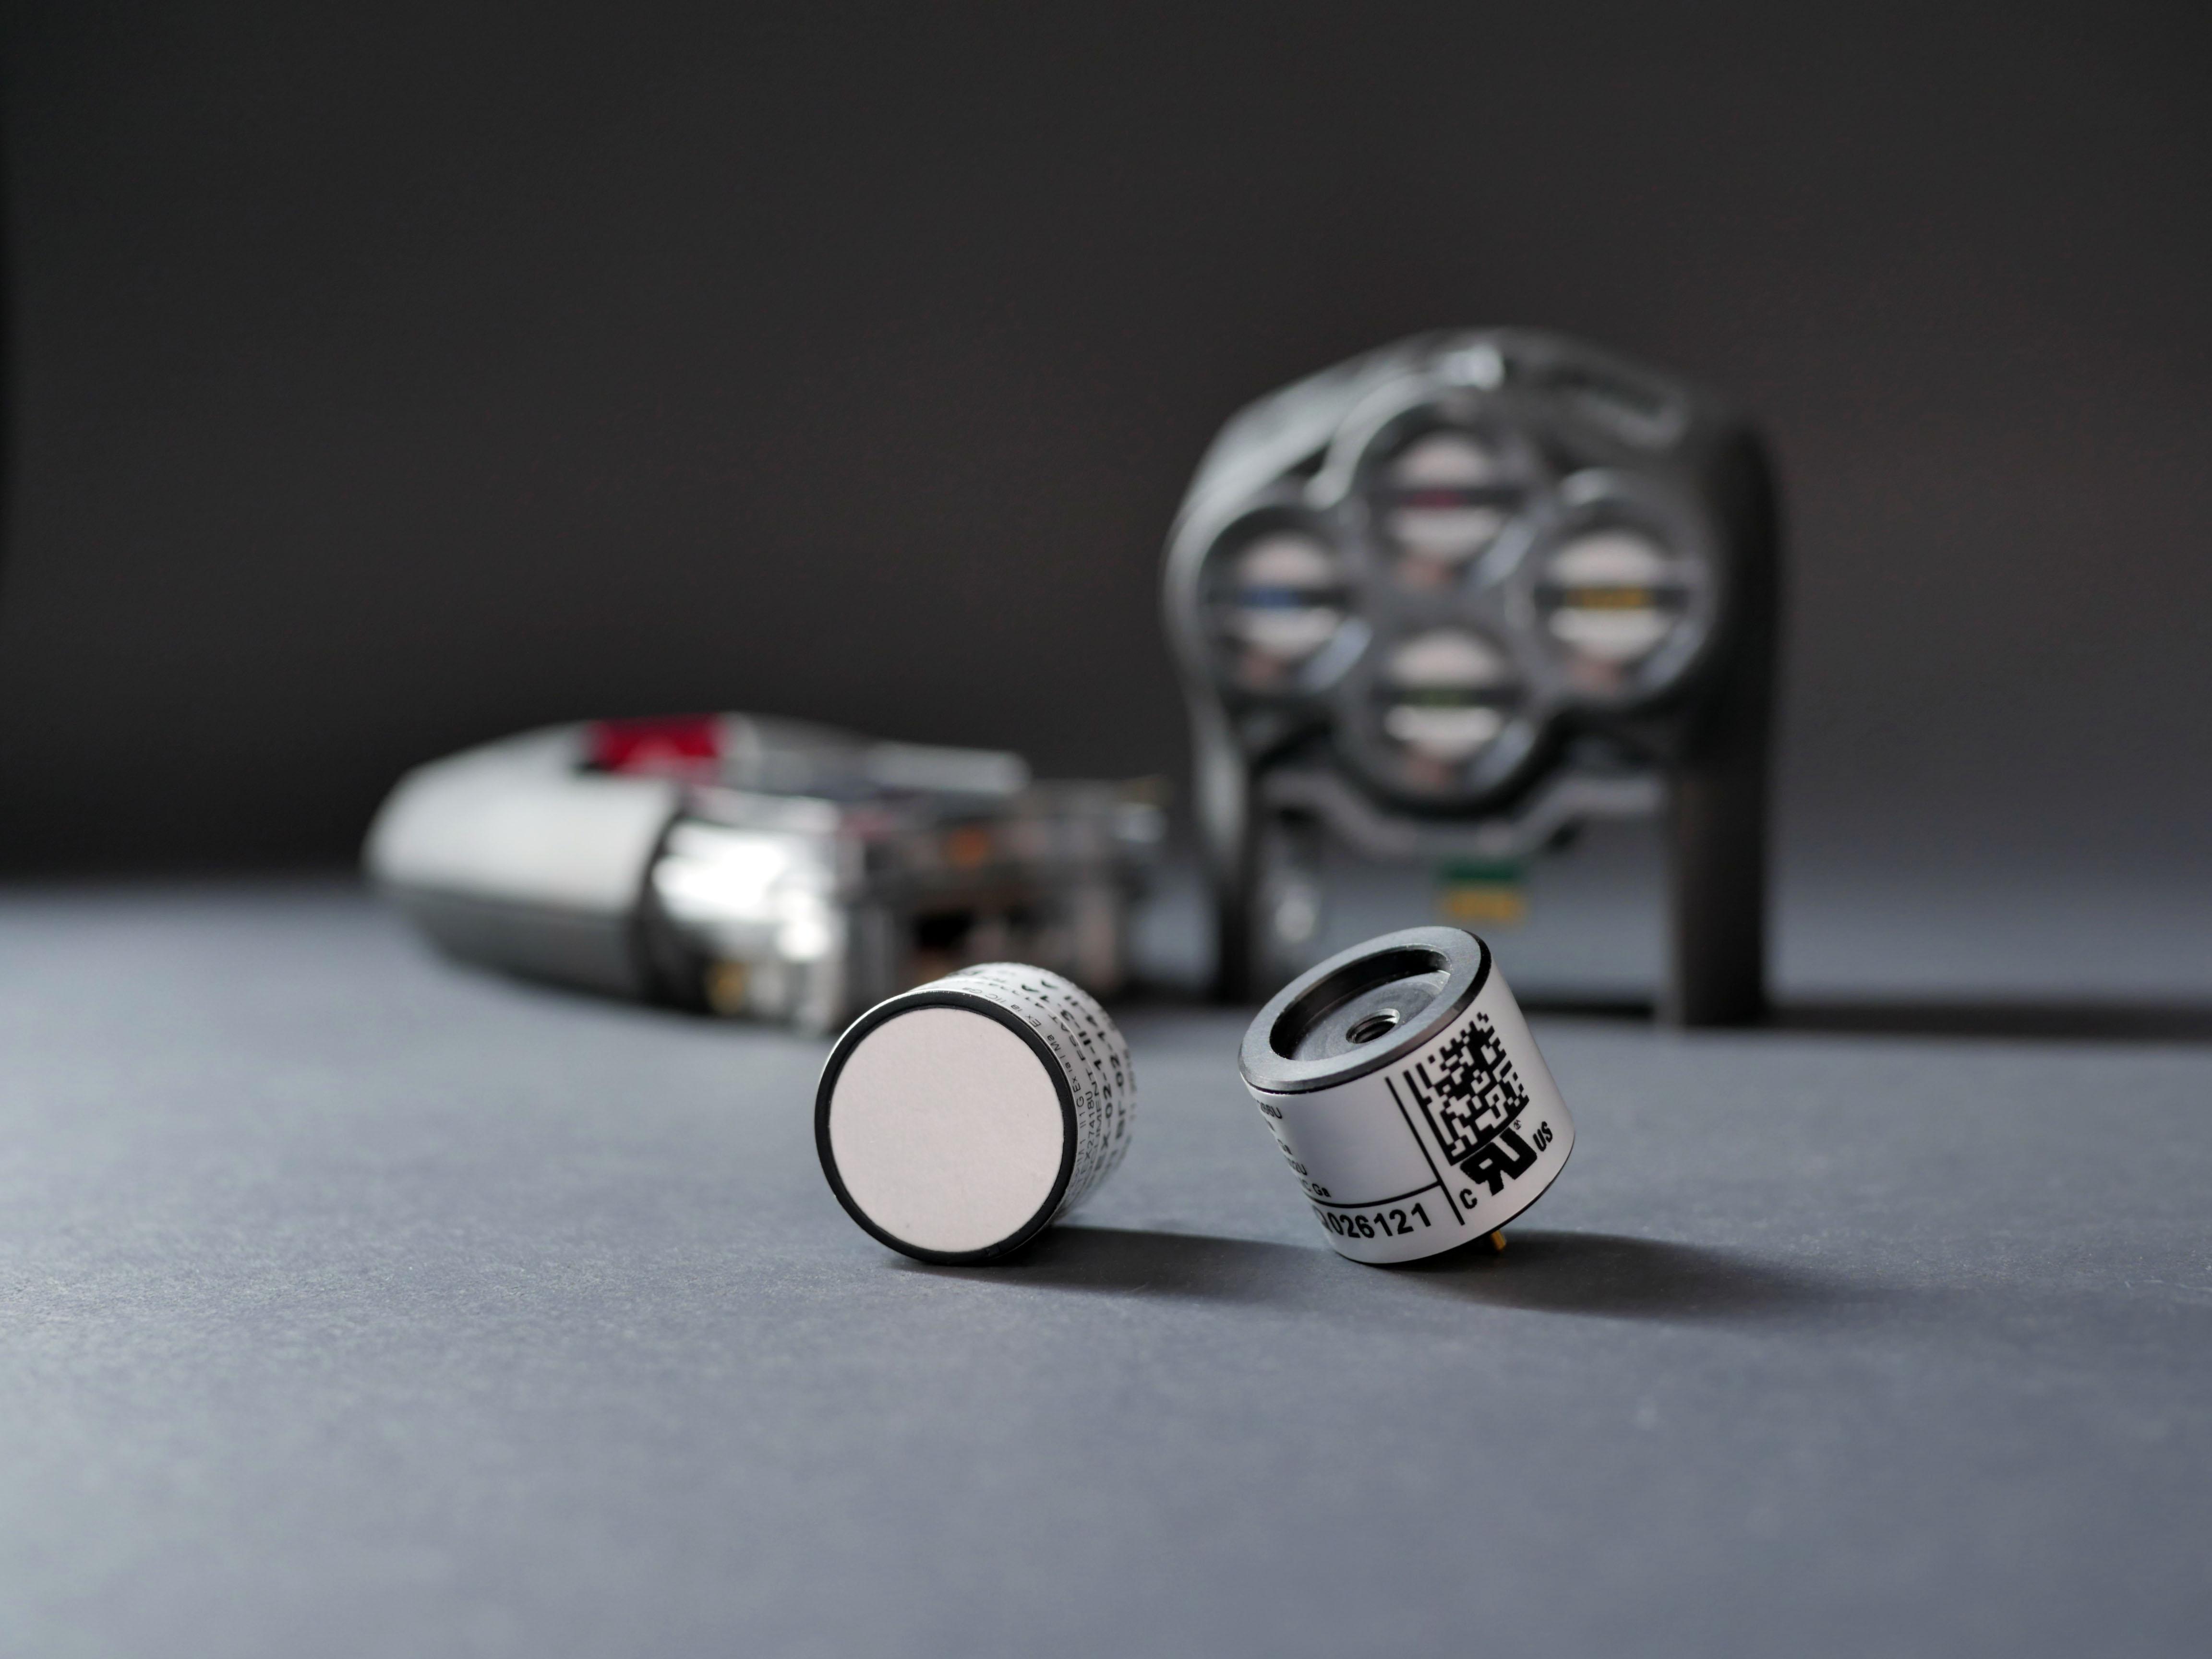 G7 LEL pellistor and IR sensors low angle